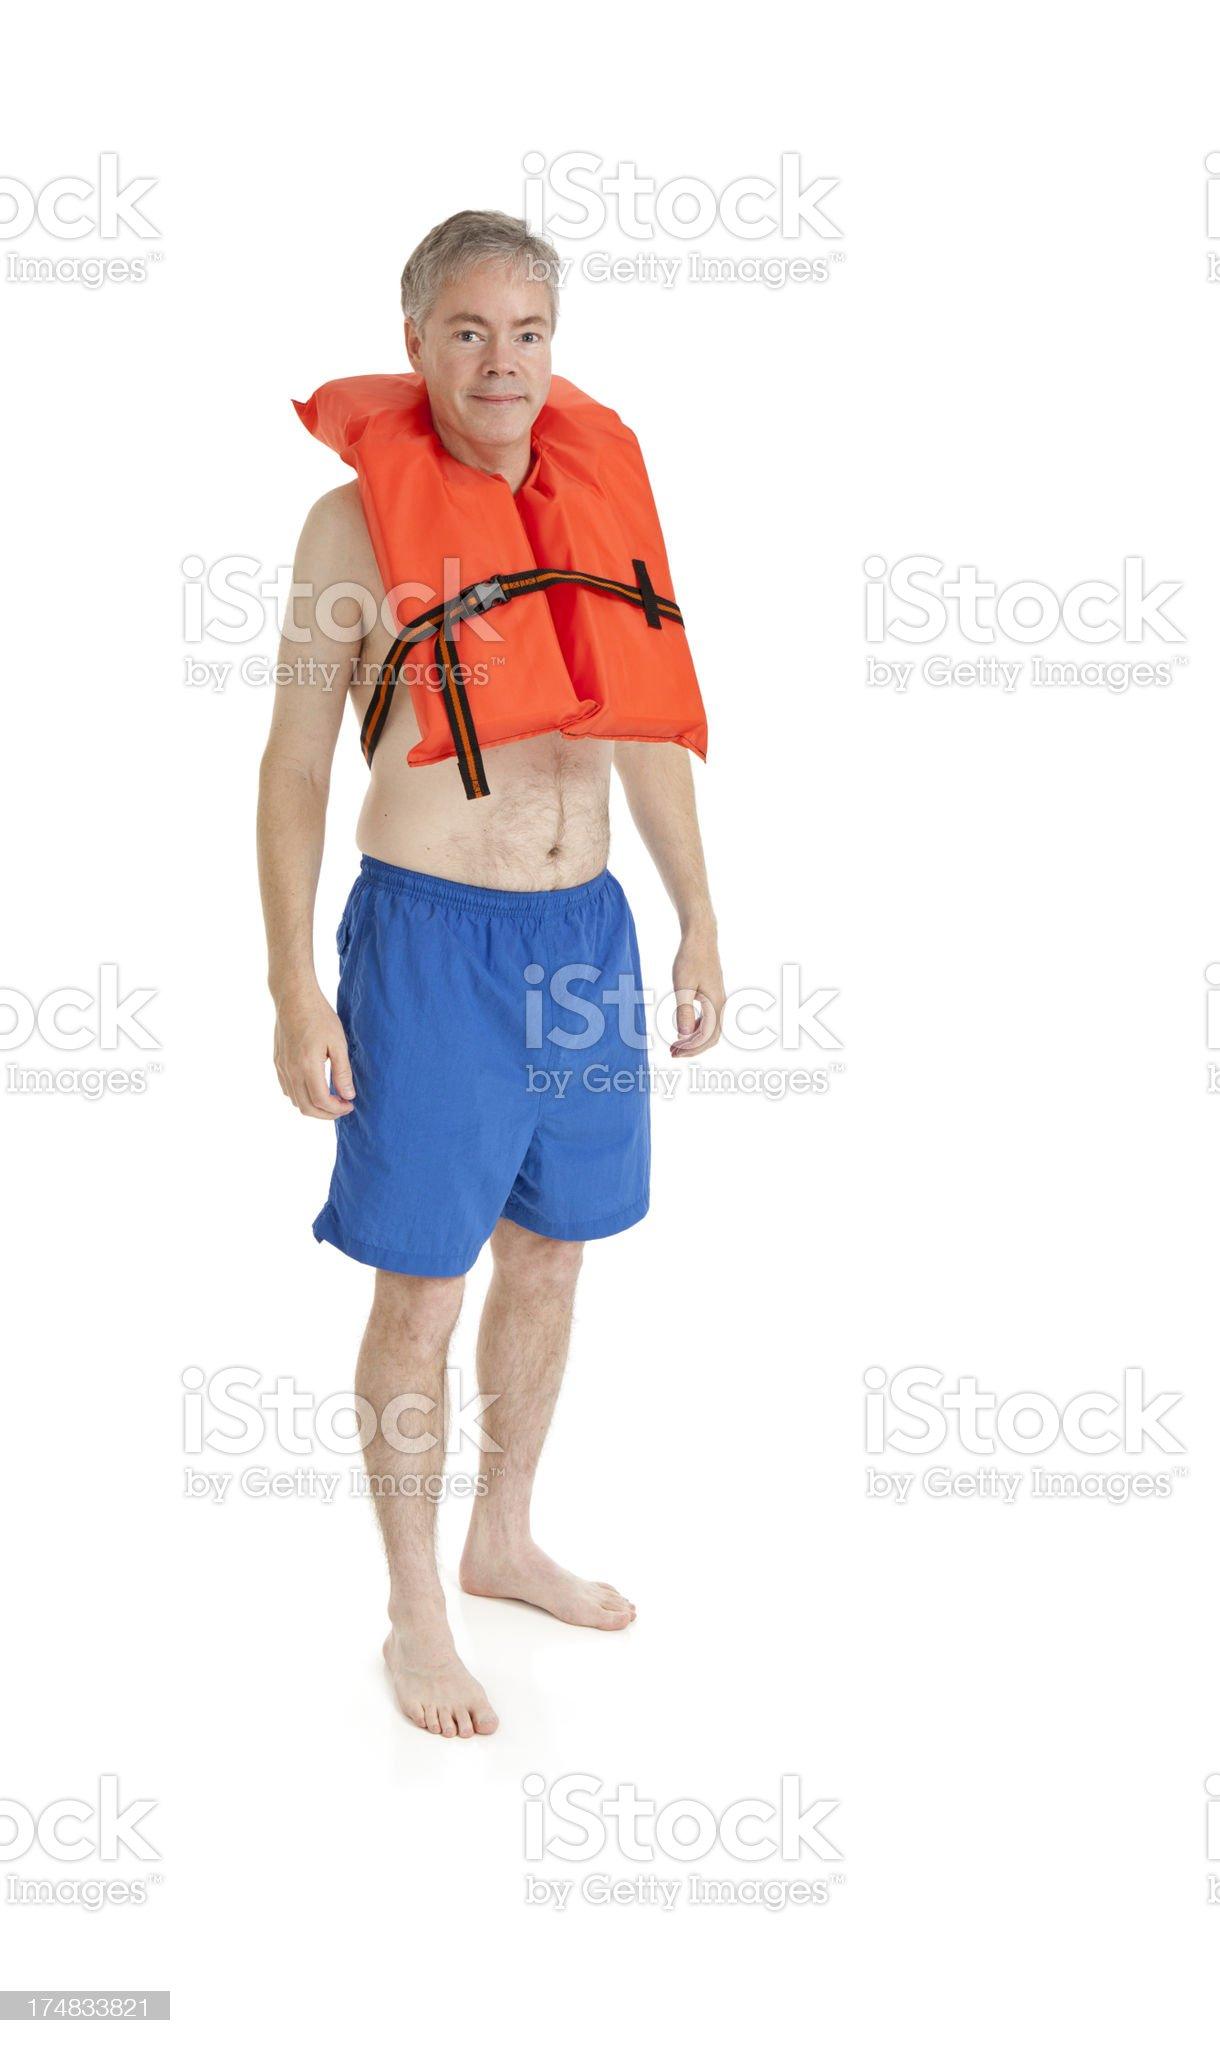 Man Wearing a Life Jacket royalty-free stock photo